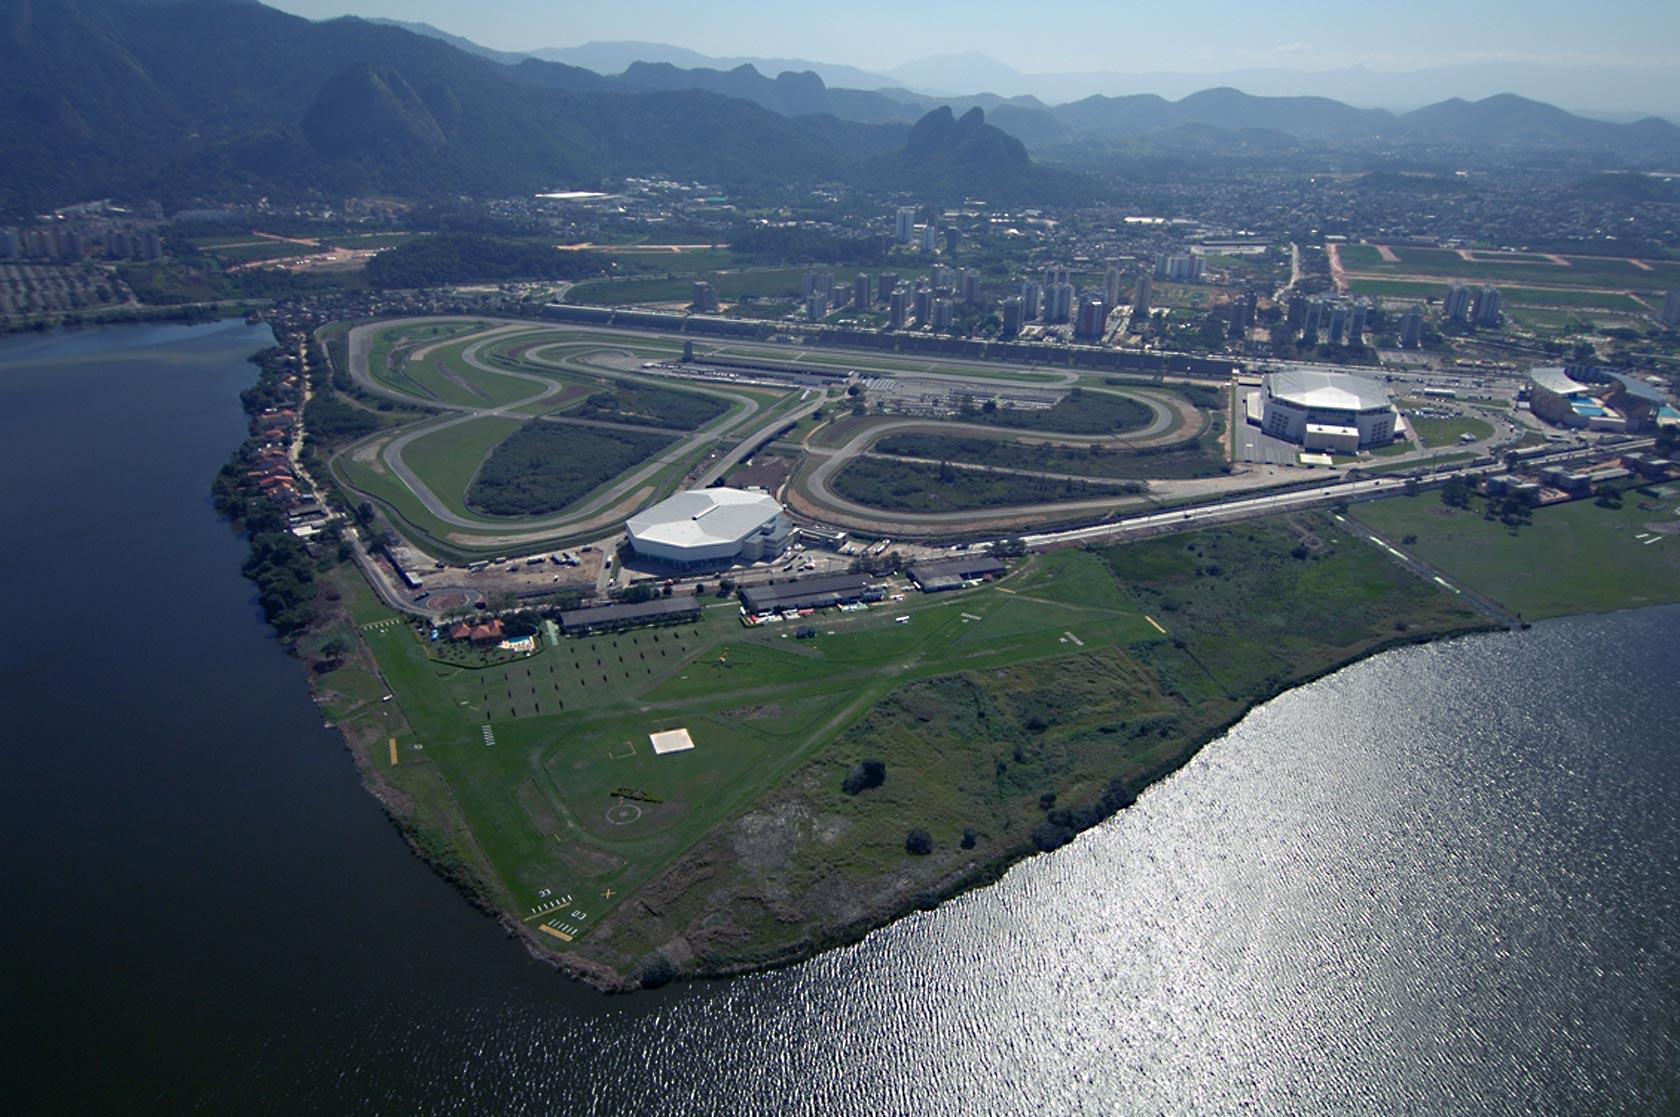 rio_2016_olympic-park_site_22-08-11